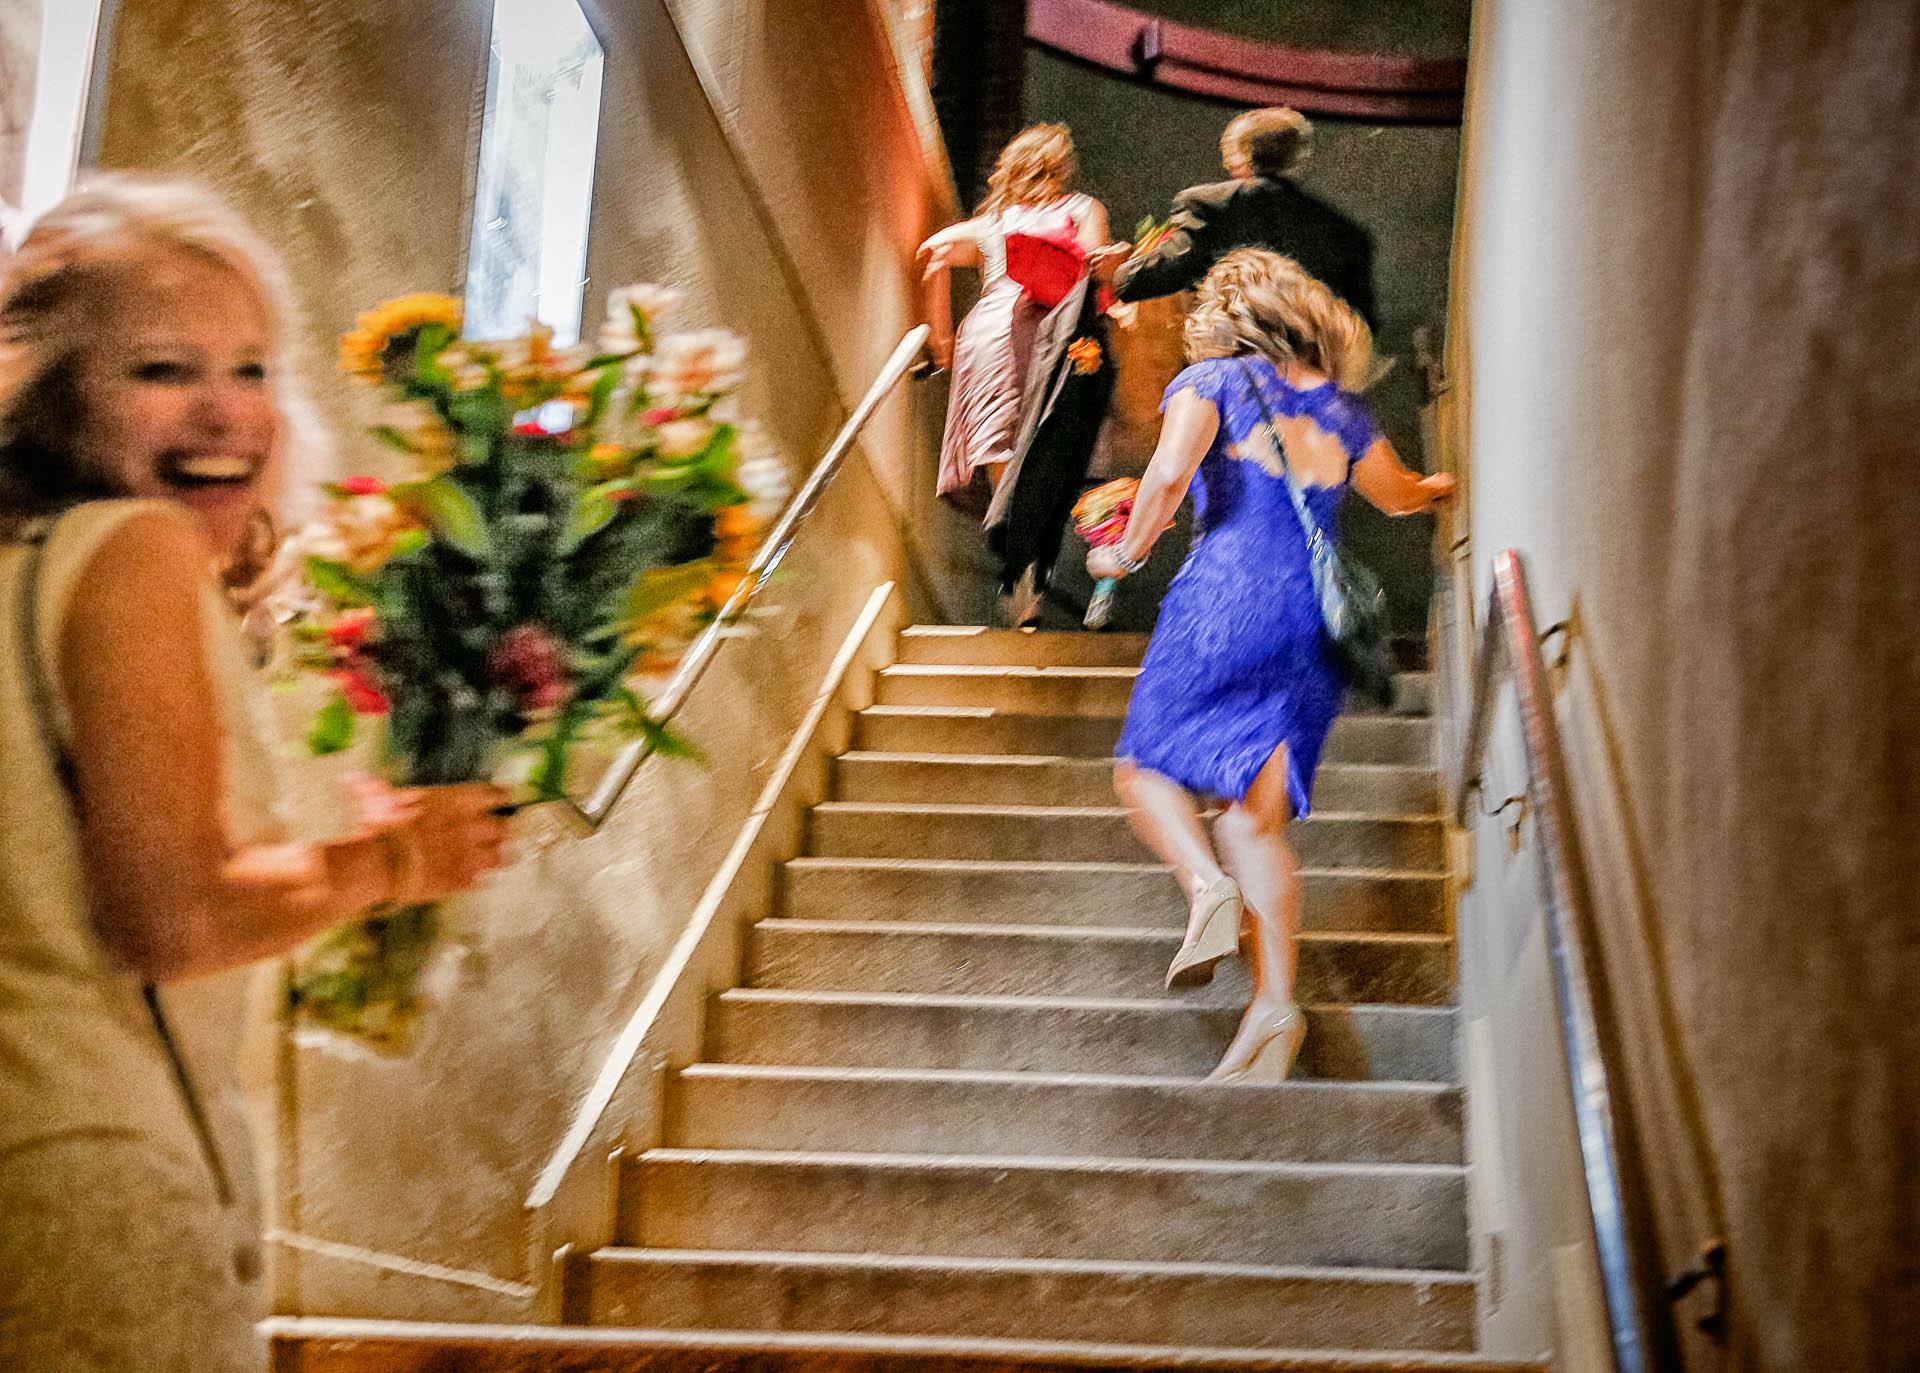 WEDDING-Karen-Mark-28Sep2014-MTO0868-Edit-Edit.jpg